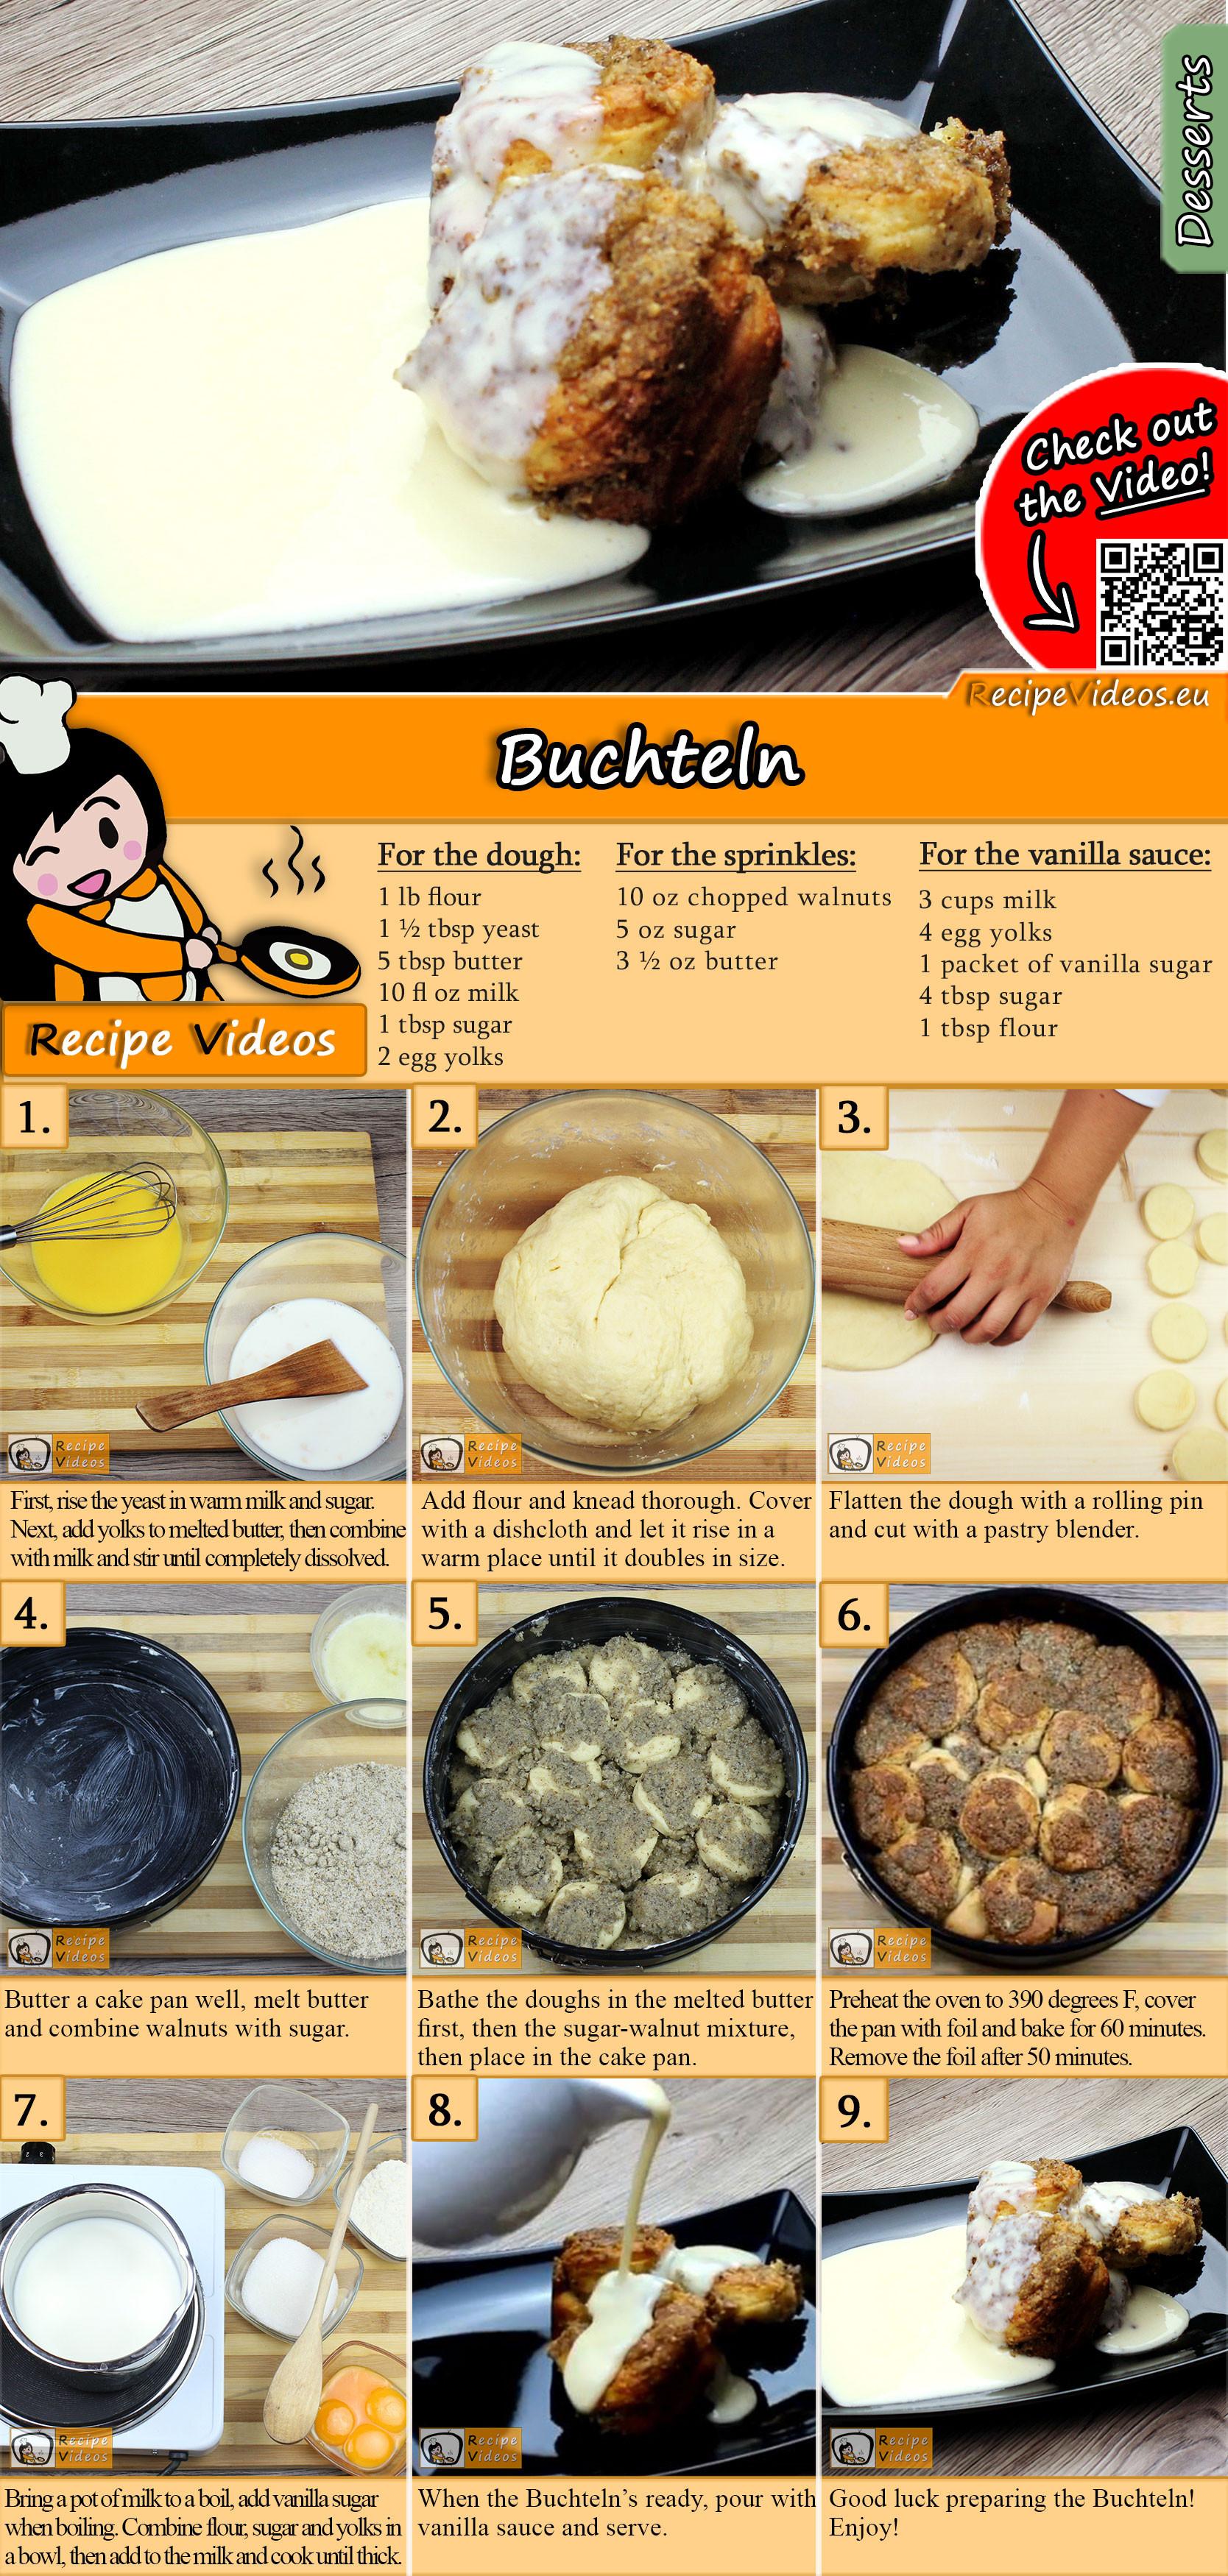 Buchteln recipe with video